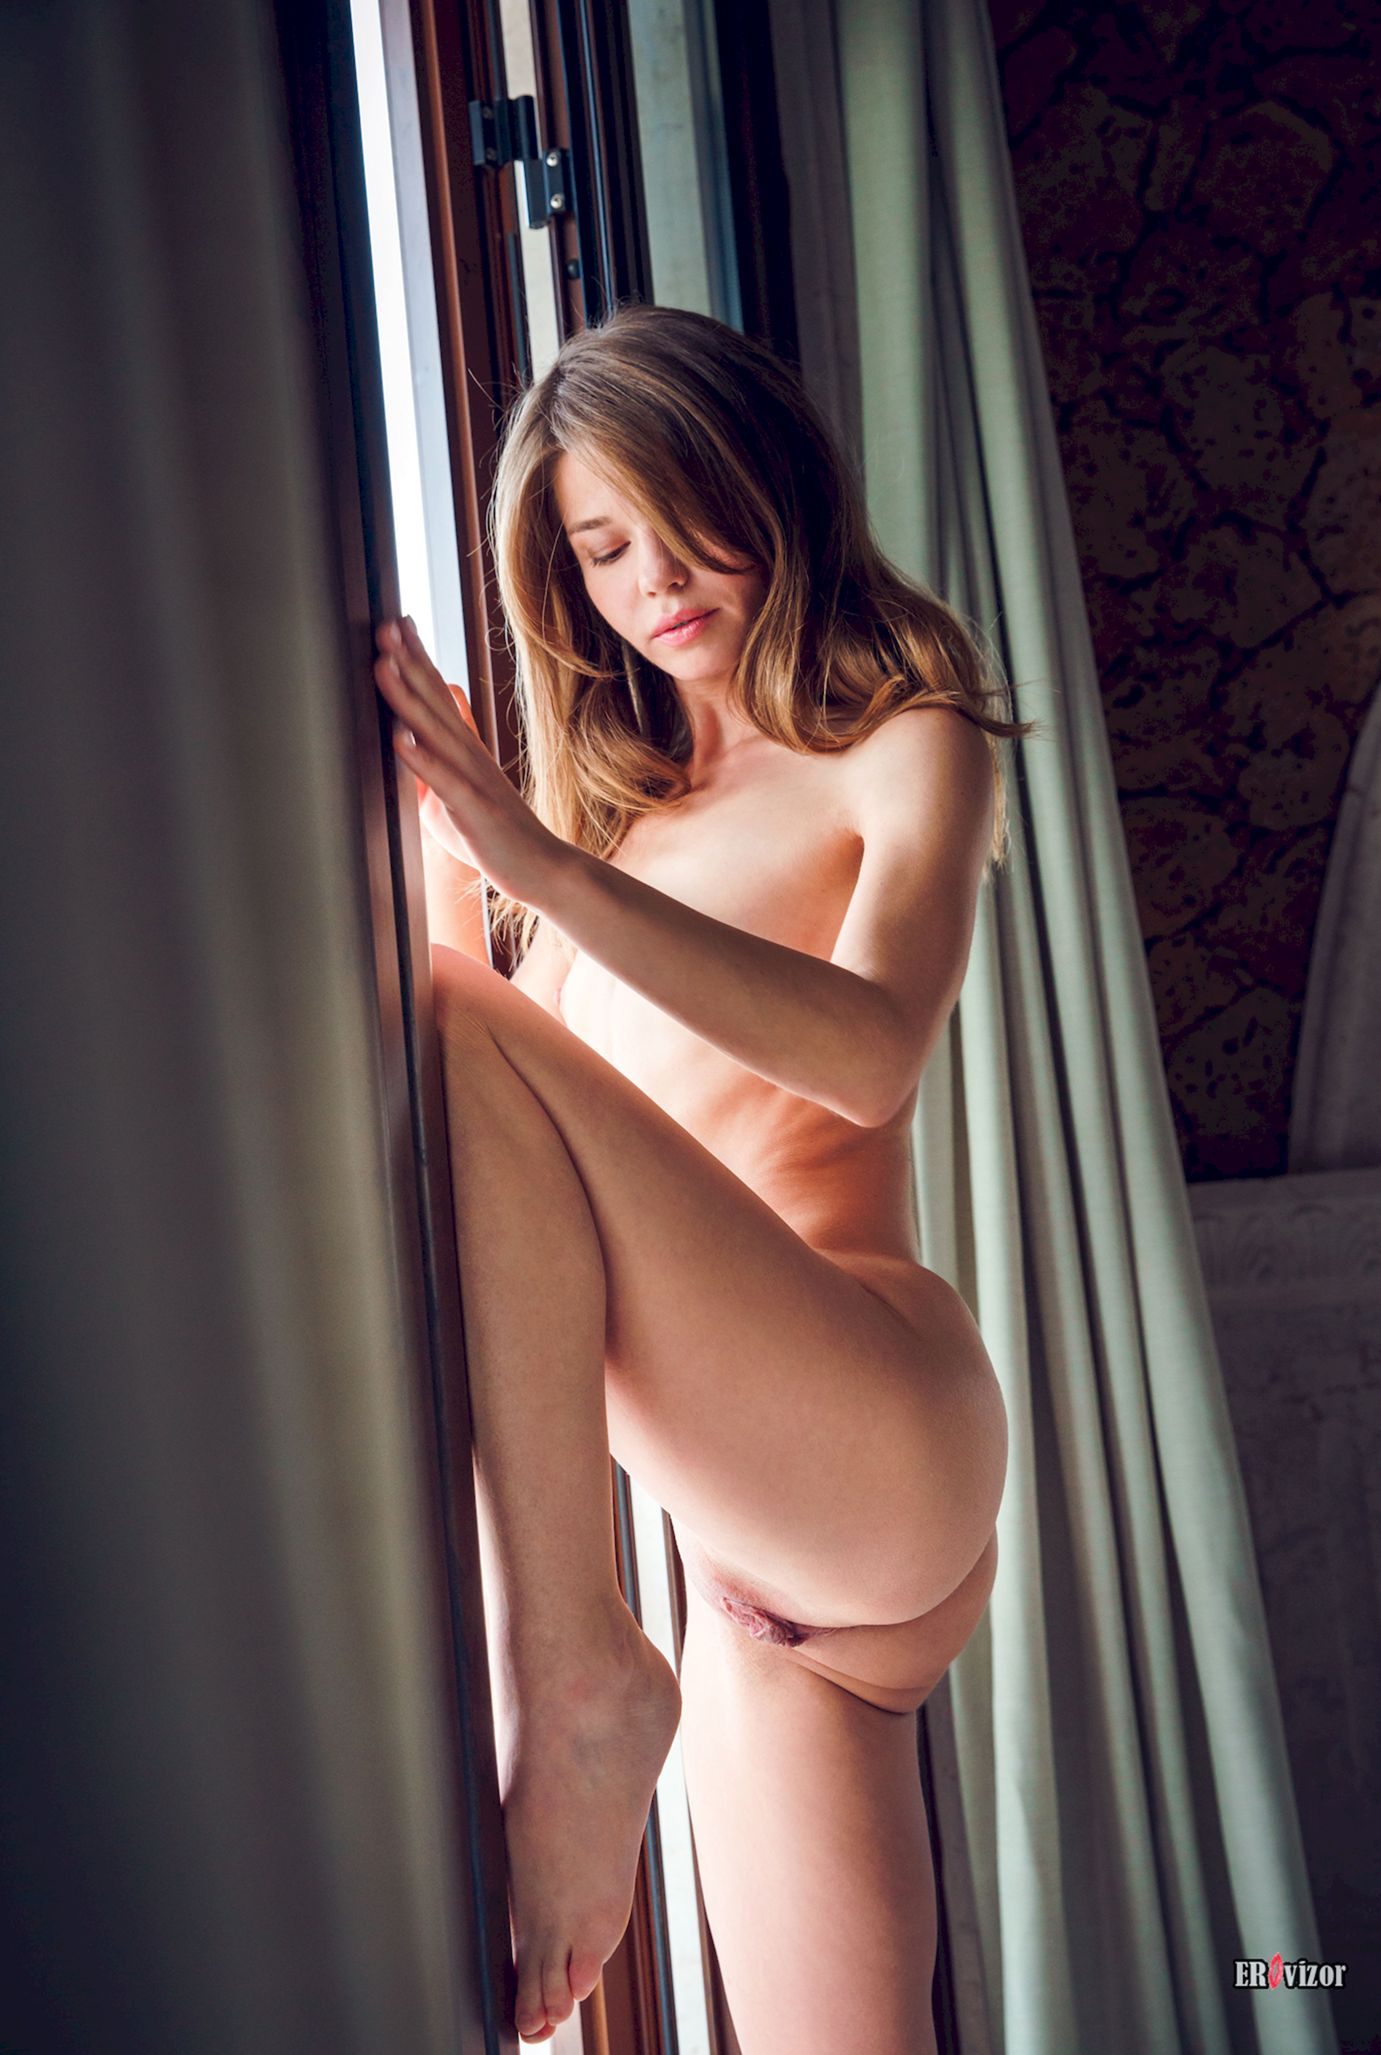 Jacqueline-erotic-set (8)